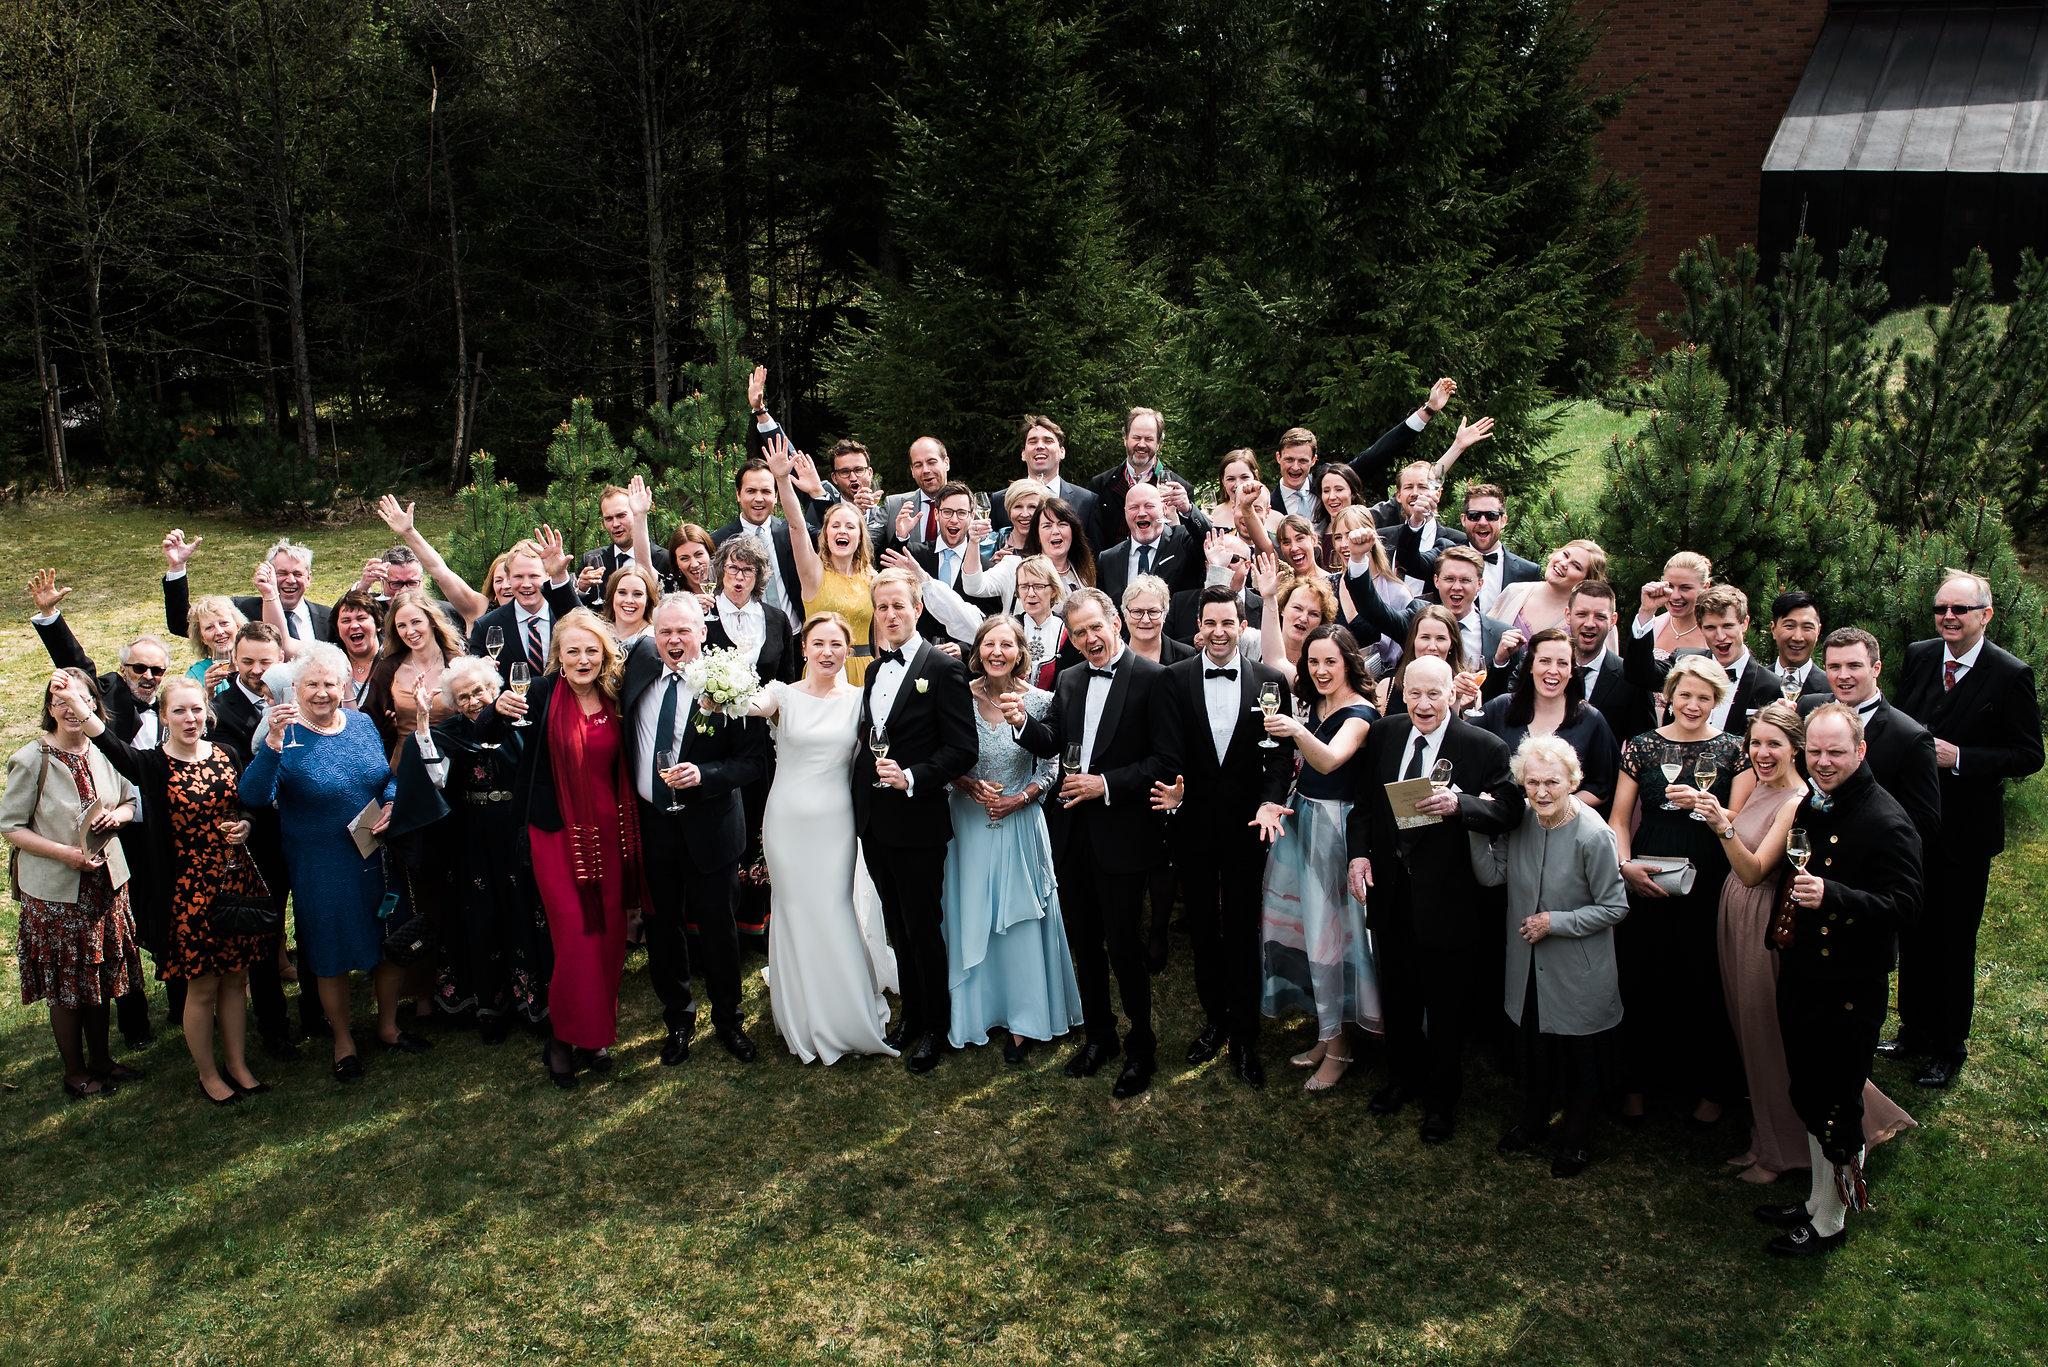 Pixlight-Bryllup-Nina-Thorbjorn47fotograf-holmekolen-oslo.jpg